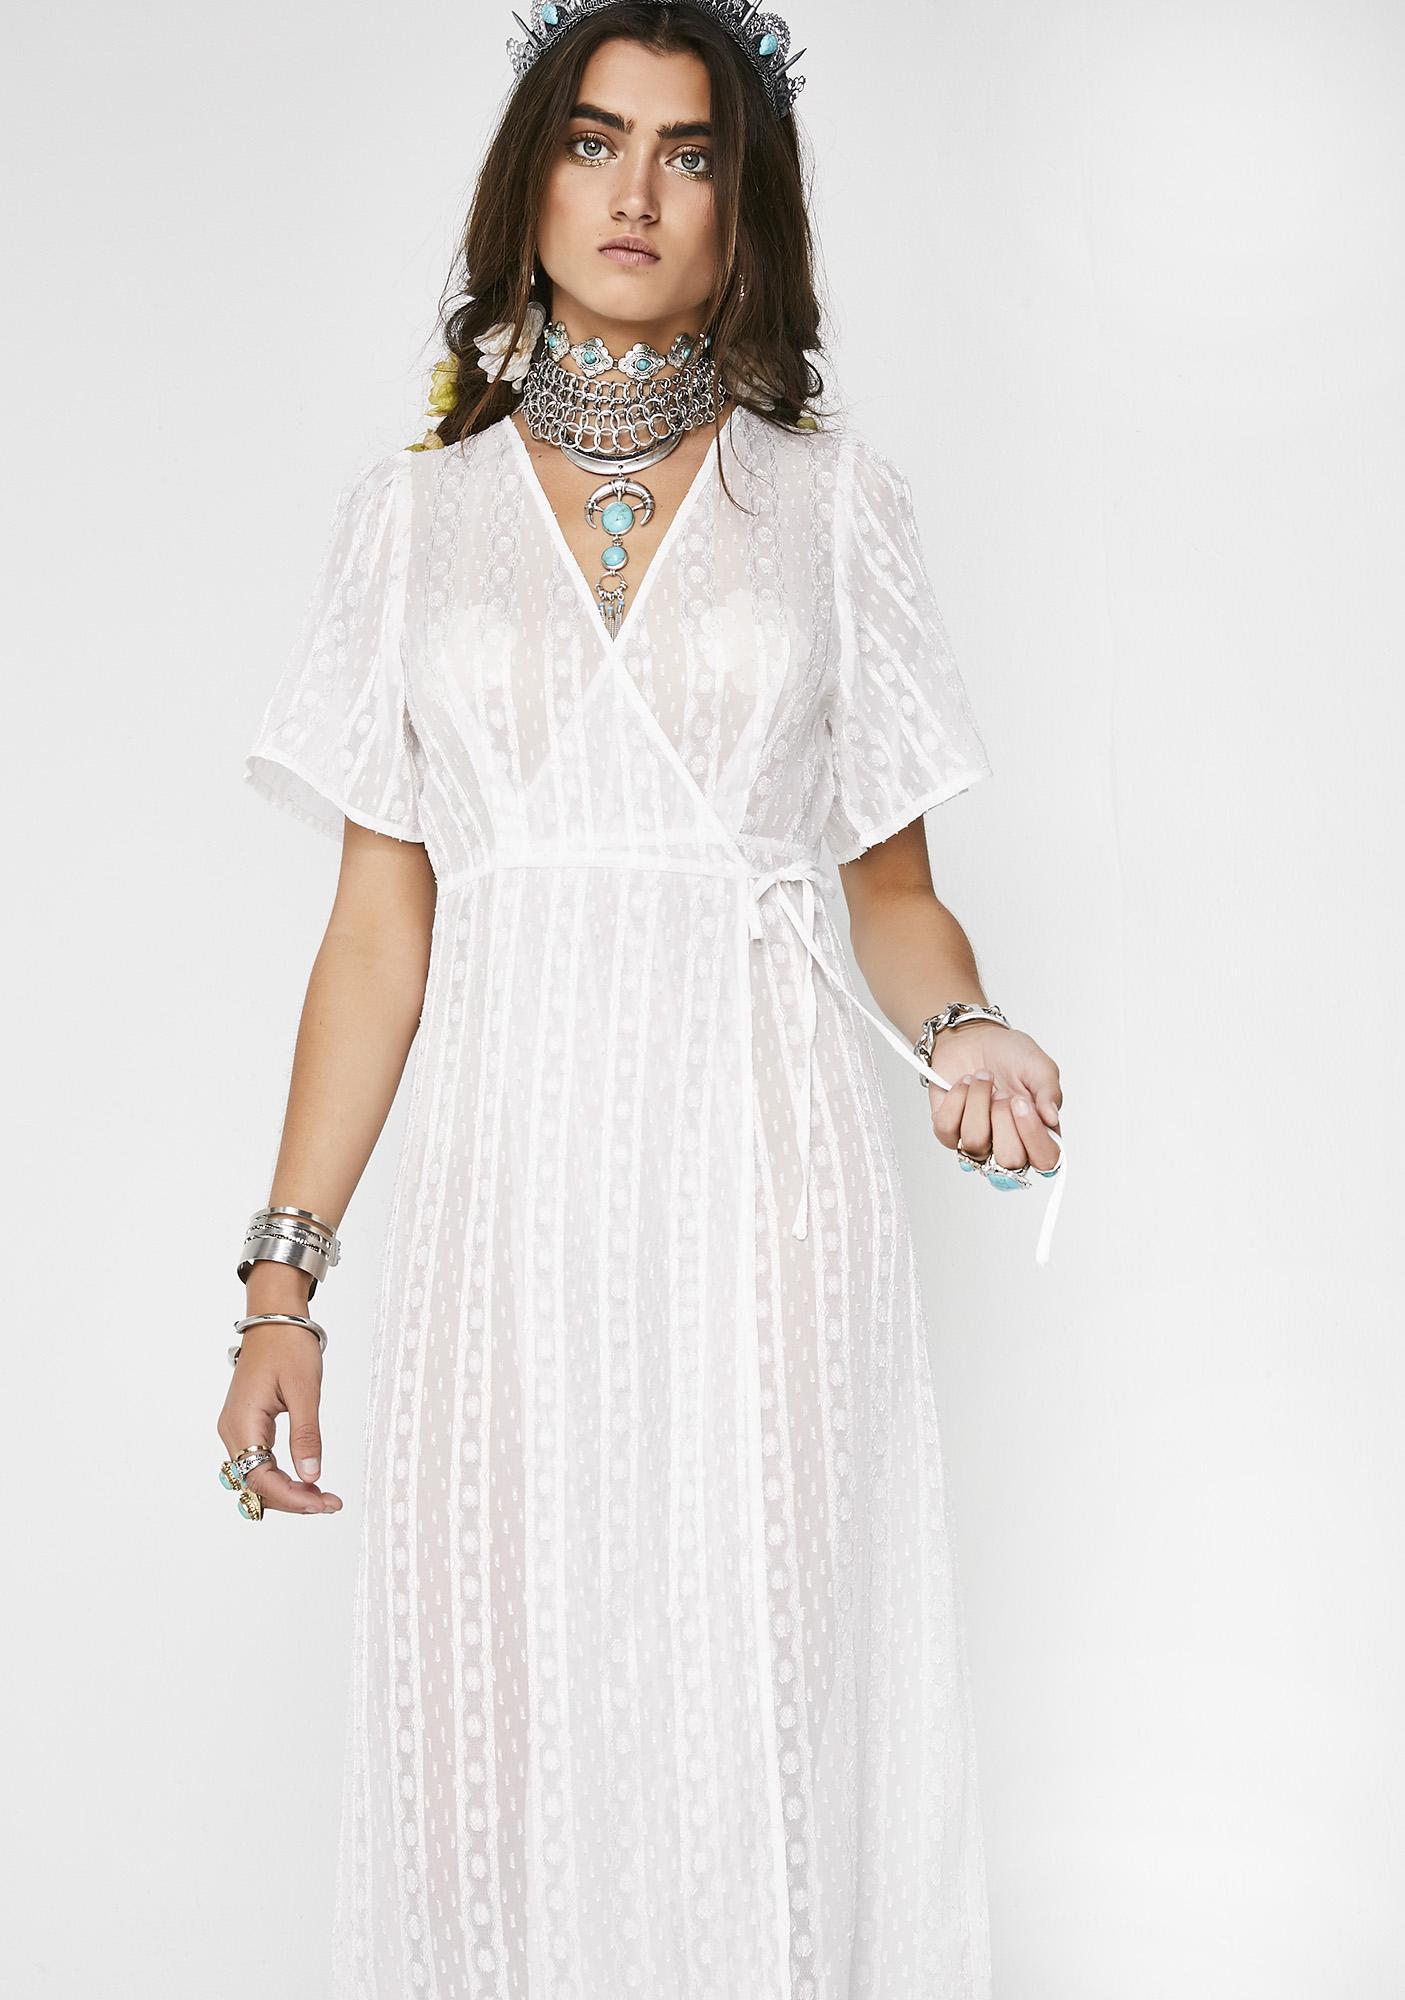 Whimsical Mind Sheer Dress